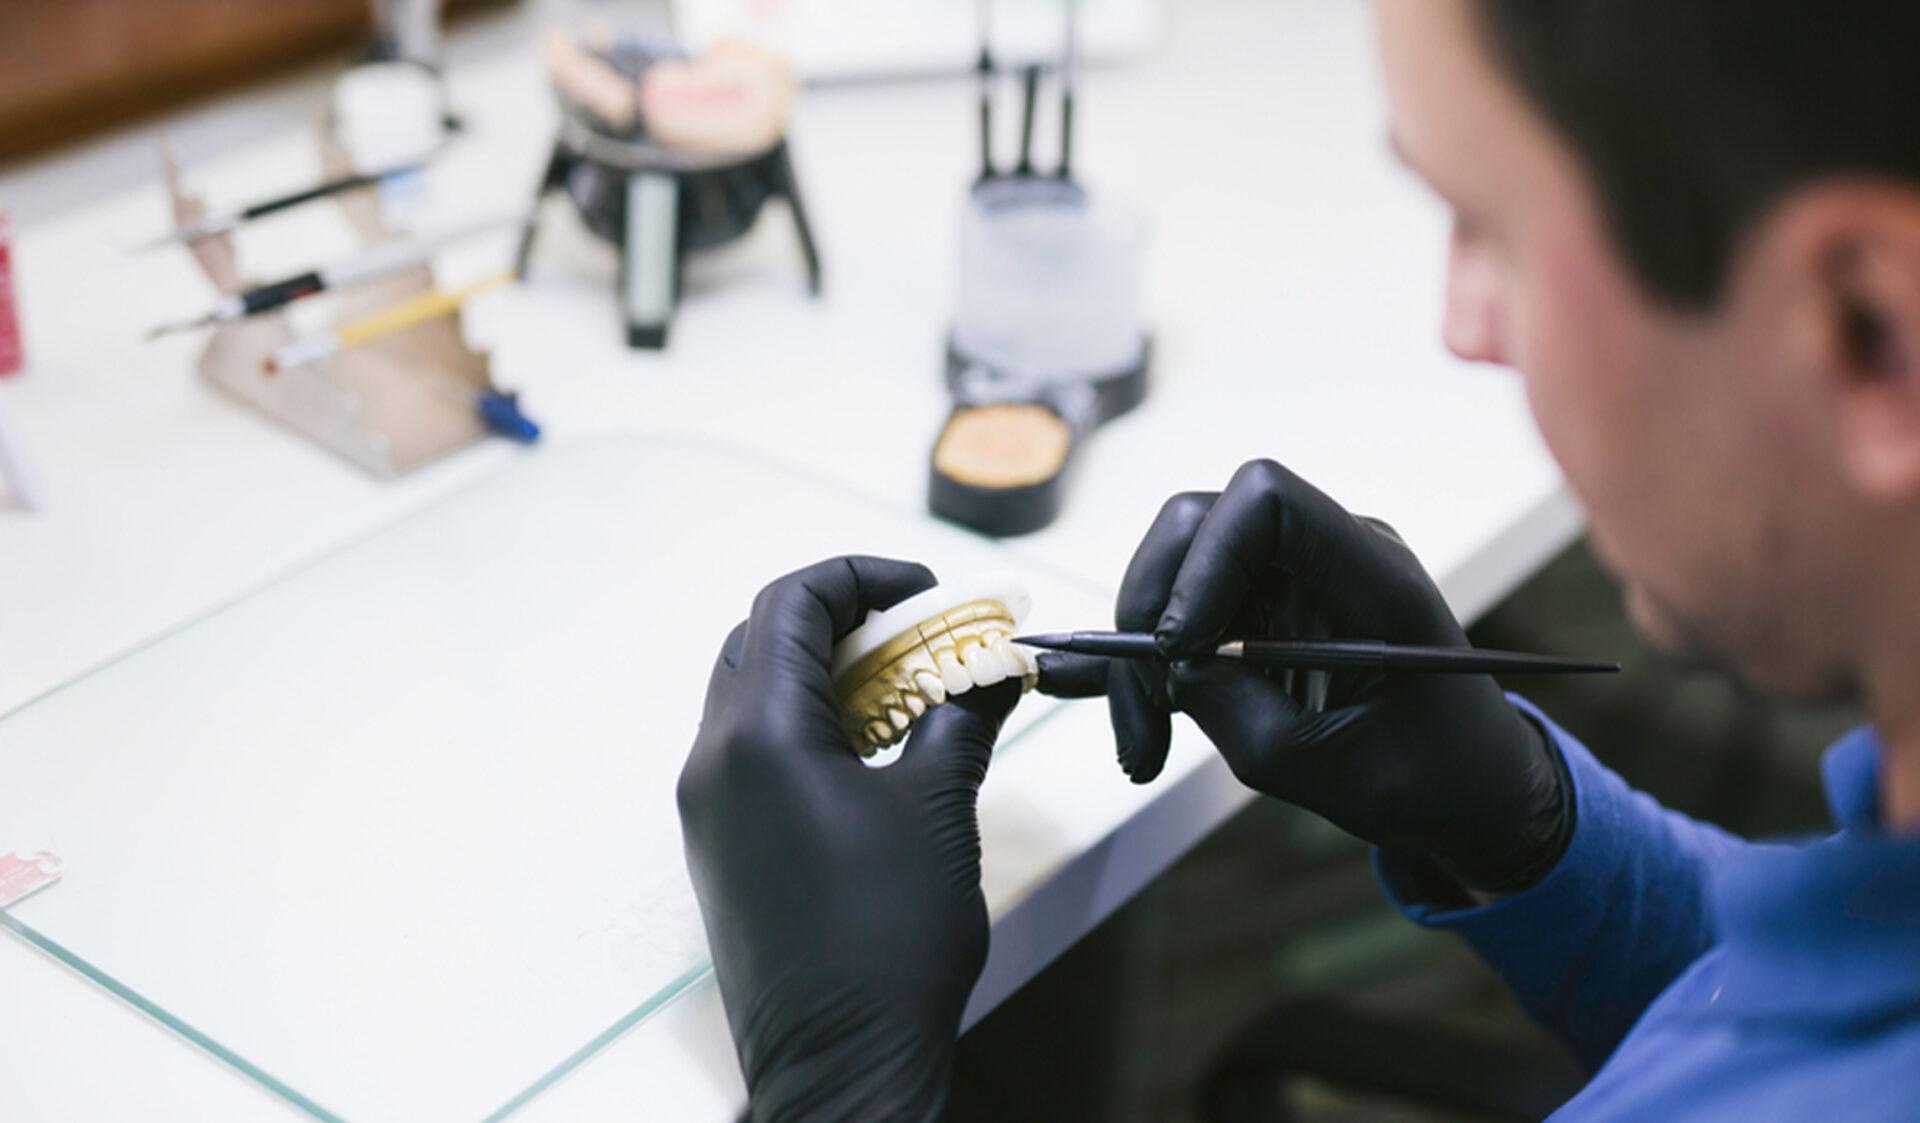 encinitas-dental-designs-services-prosthodontists